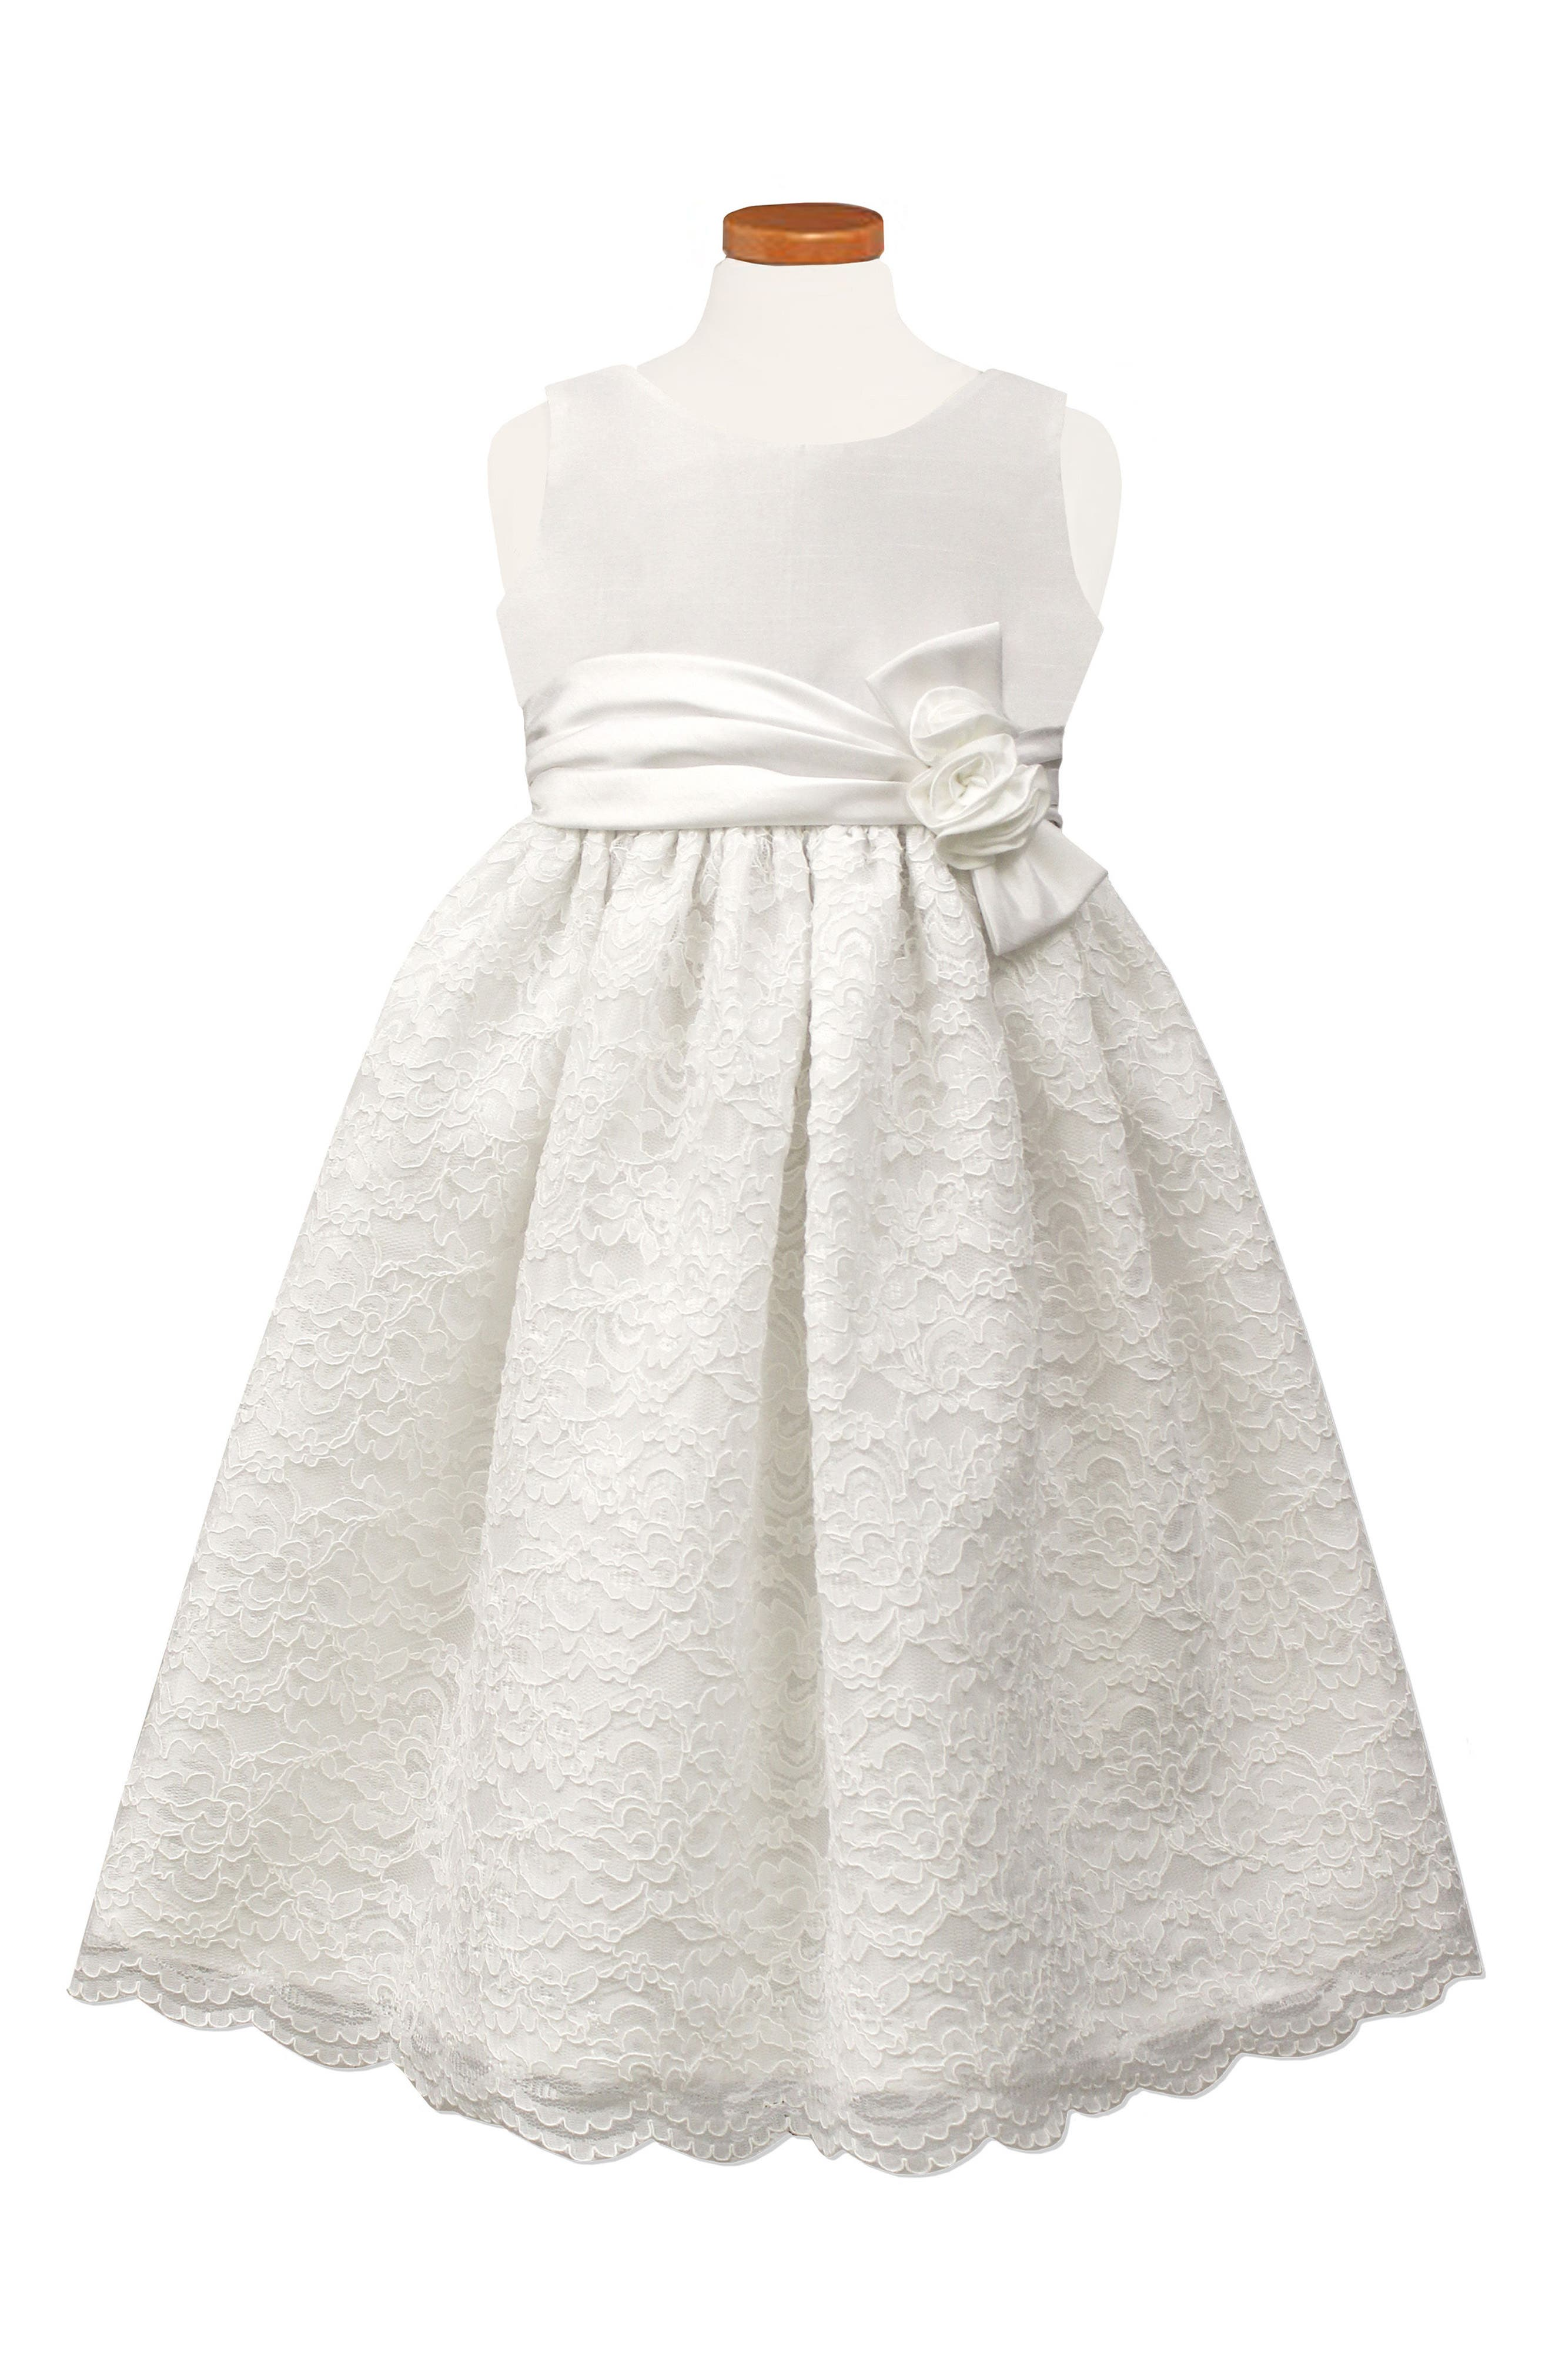 Satin & Lace Party Dress,                             Main thumbnail 1, color,                             100